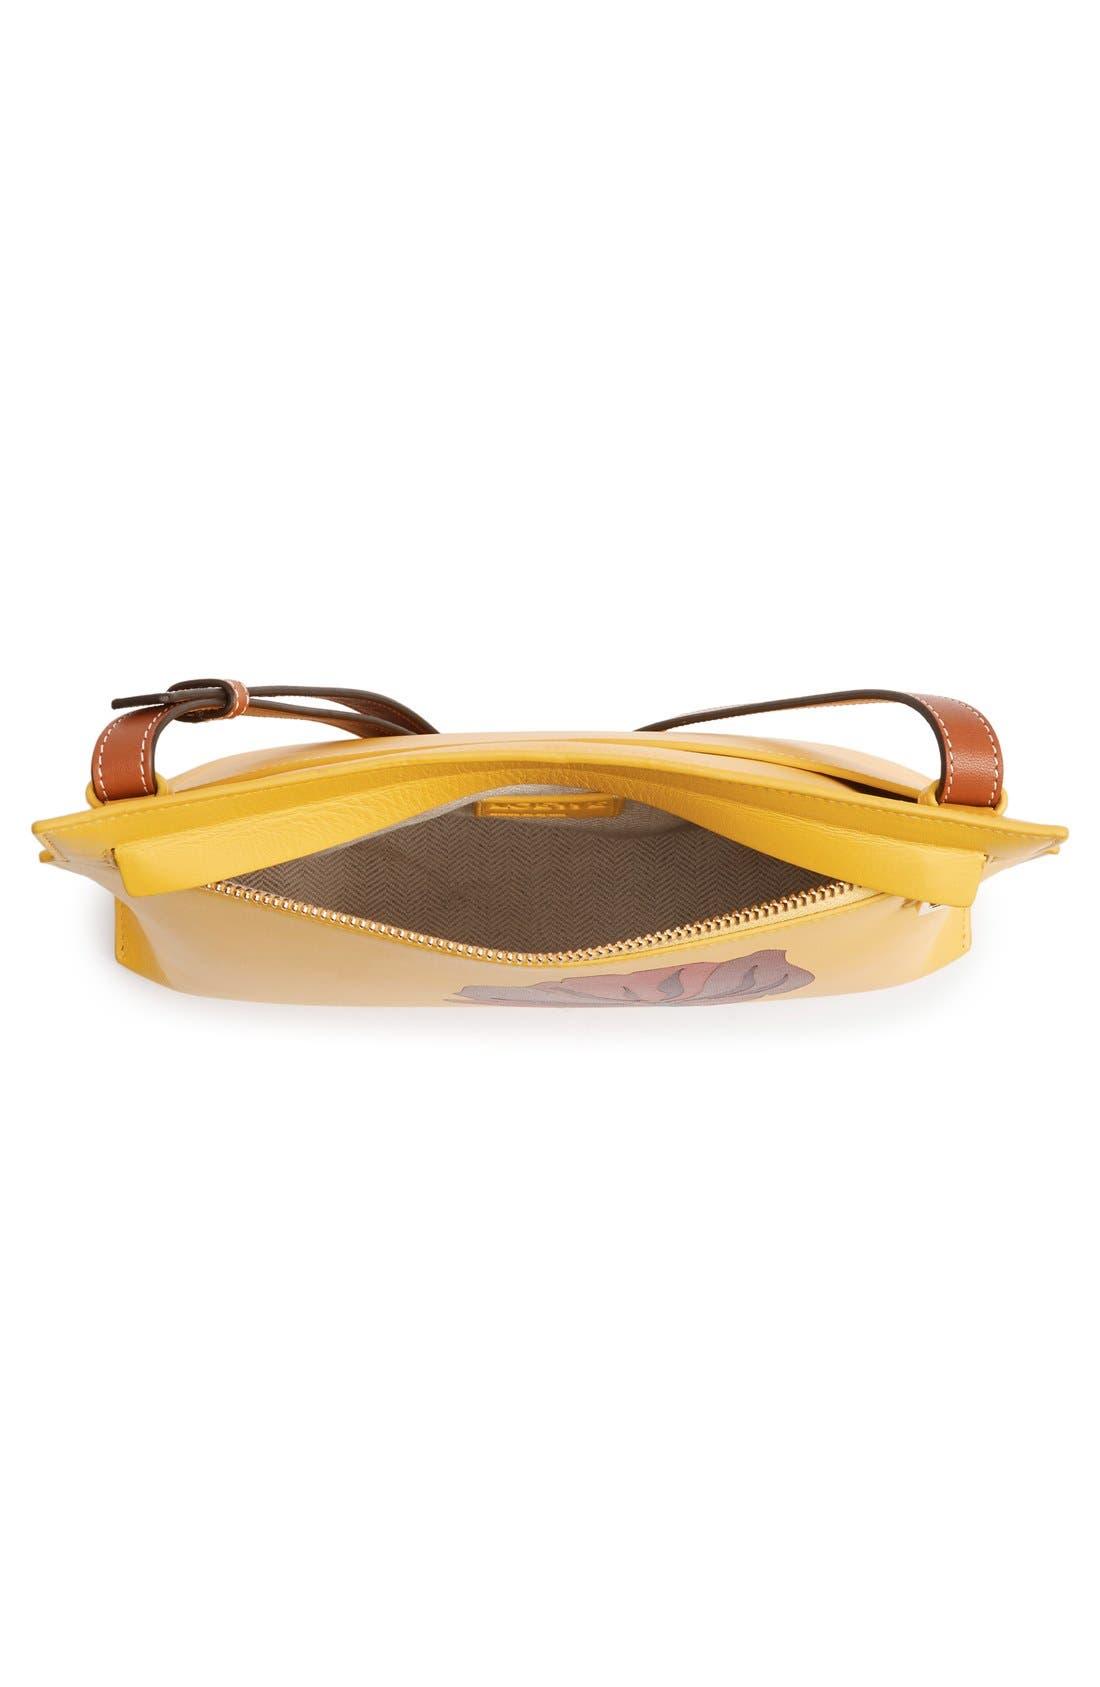 Alternate Image 4  - Loewe 'Fiore' Marquetry Calfskin Leather Crossbody Clutch